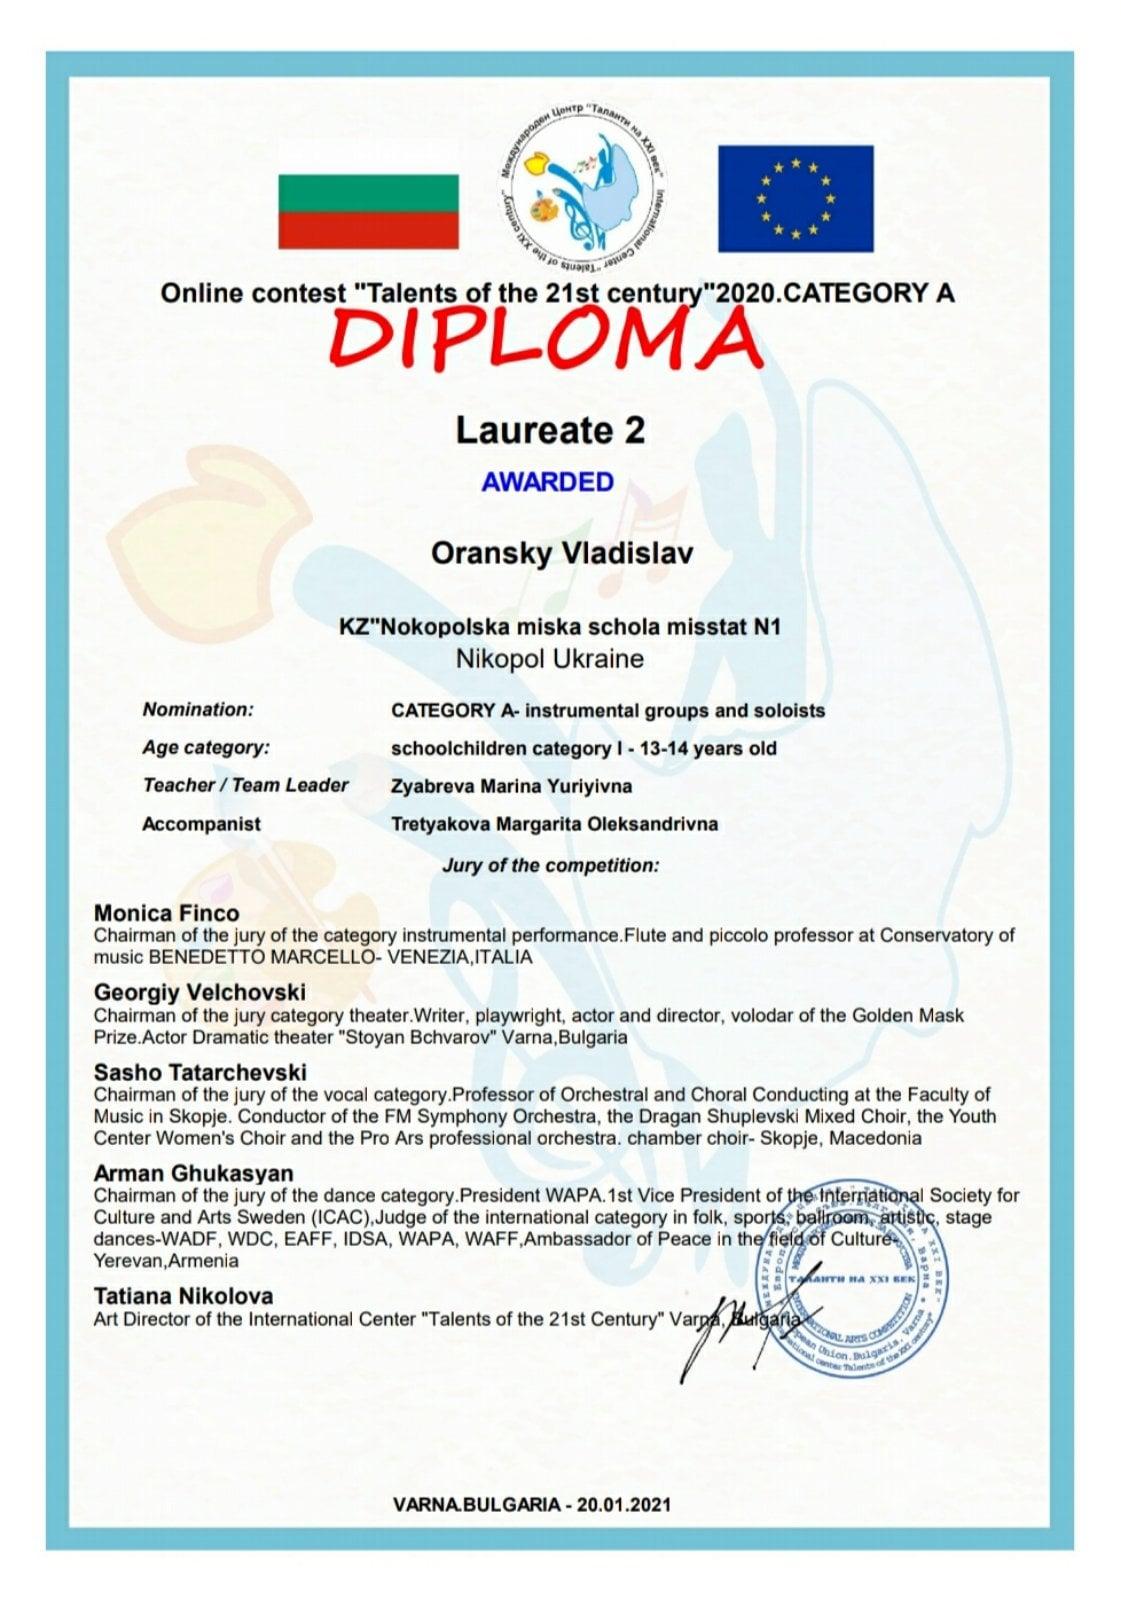 Дипломы болгарского конкурса